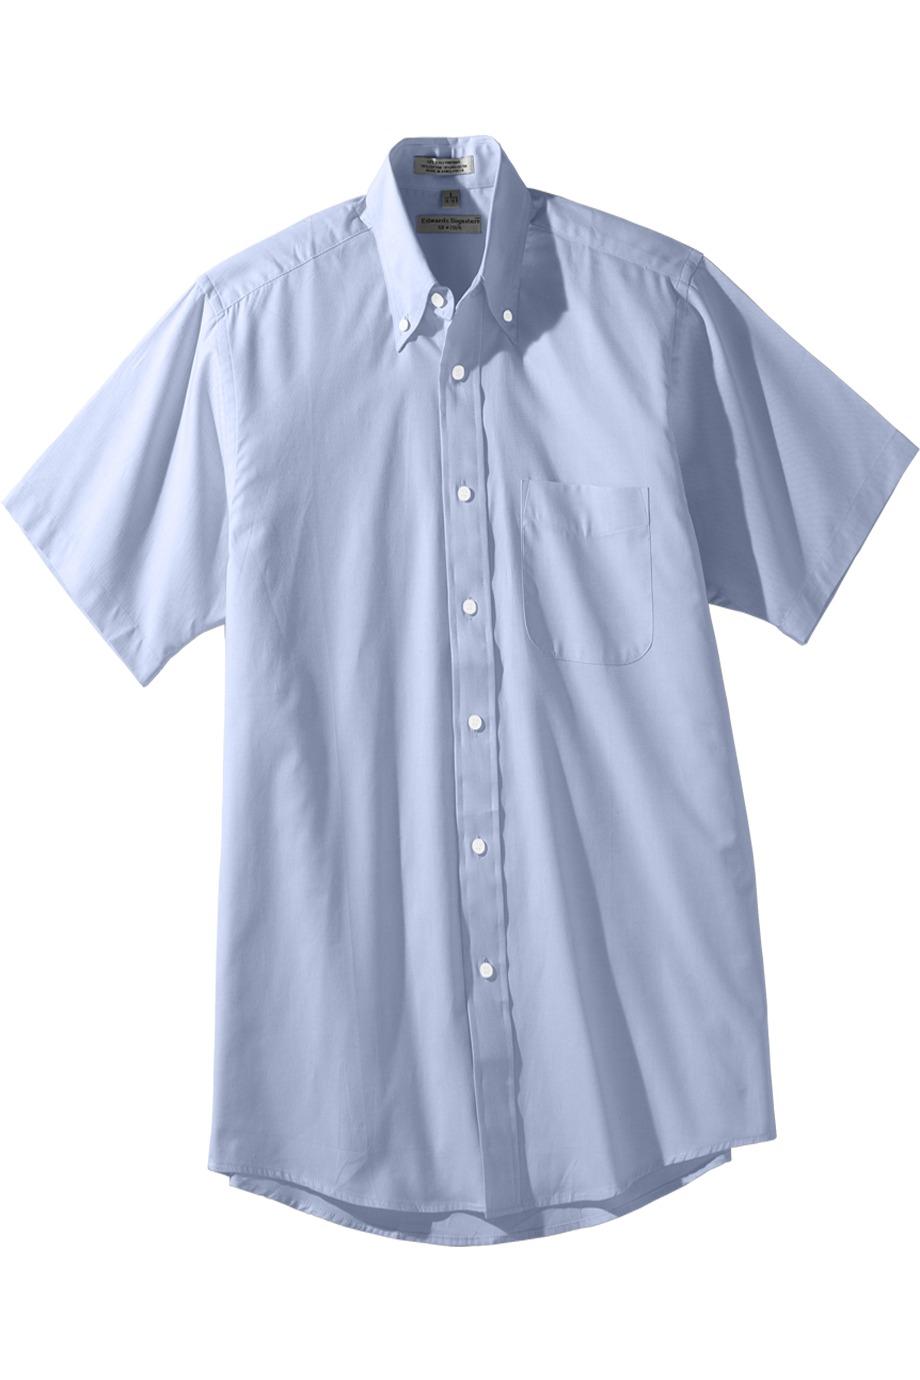 Edwards Garment 1925 - Men's Short Sleeve Pinpoint Oxford Shirt